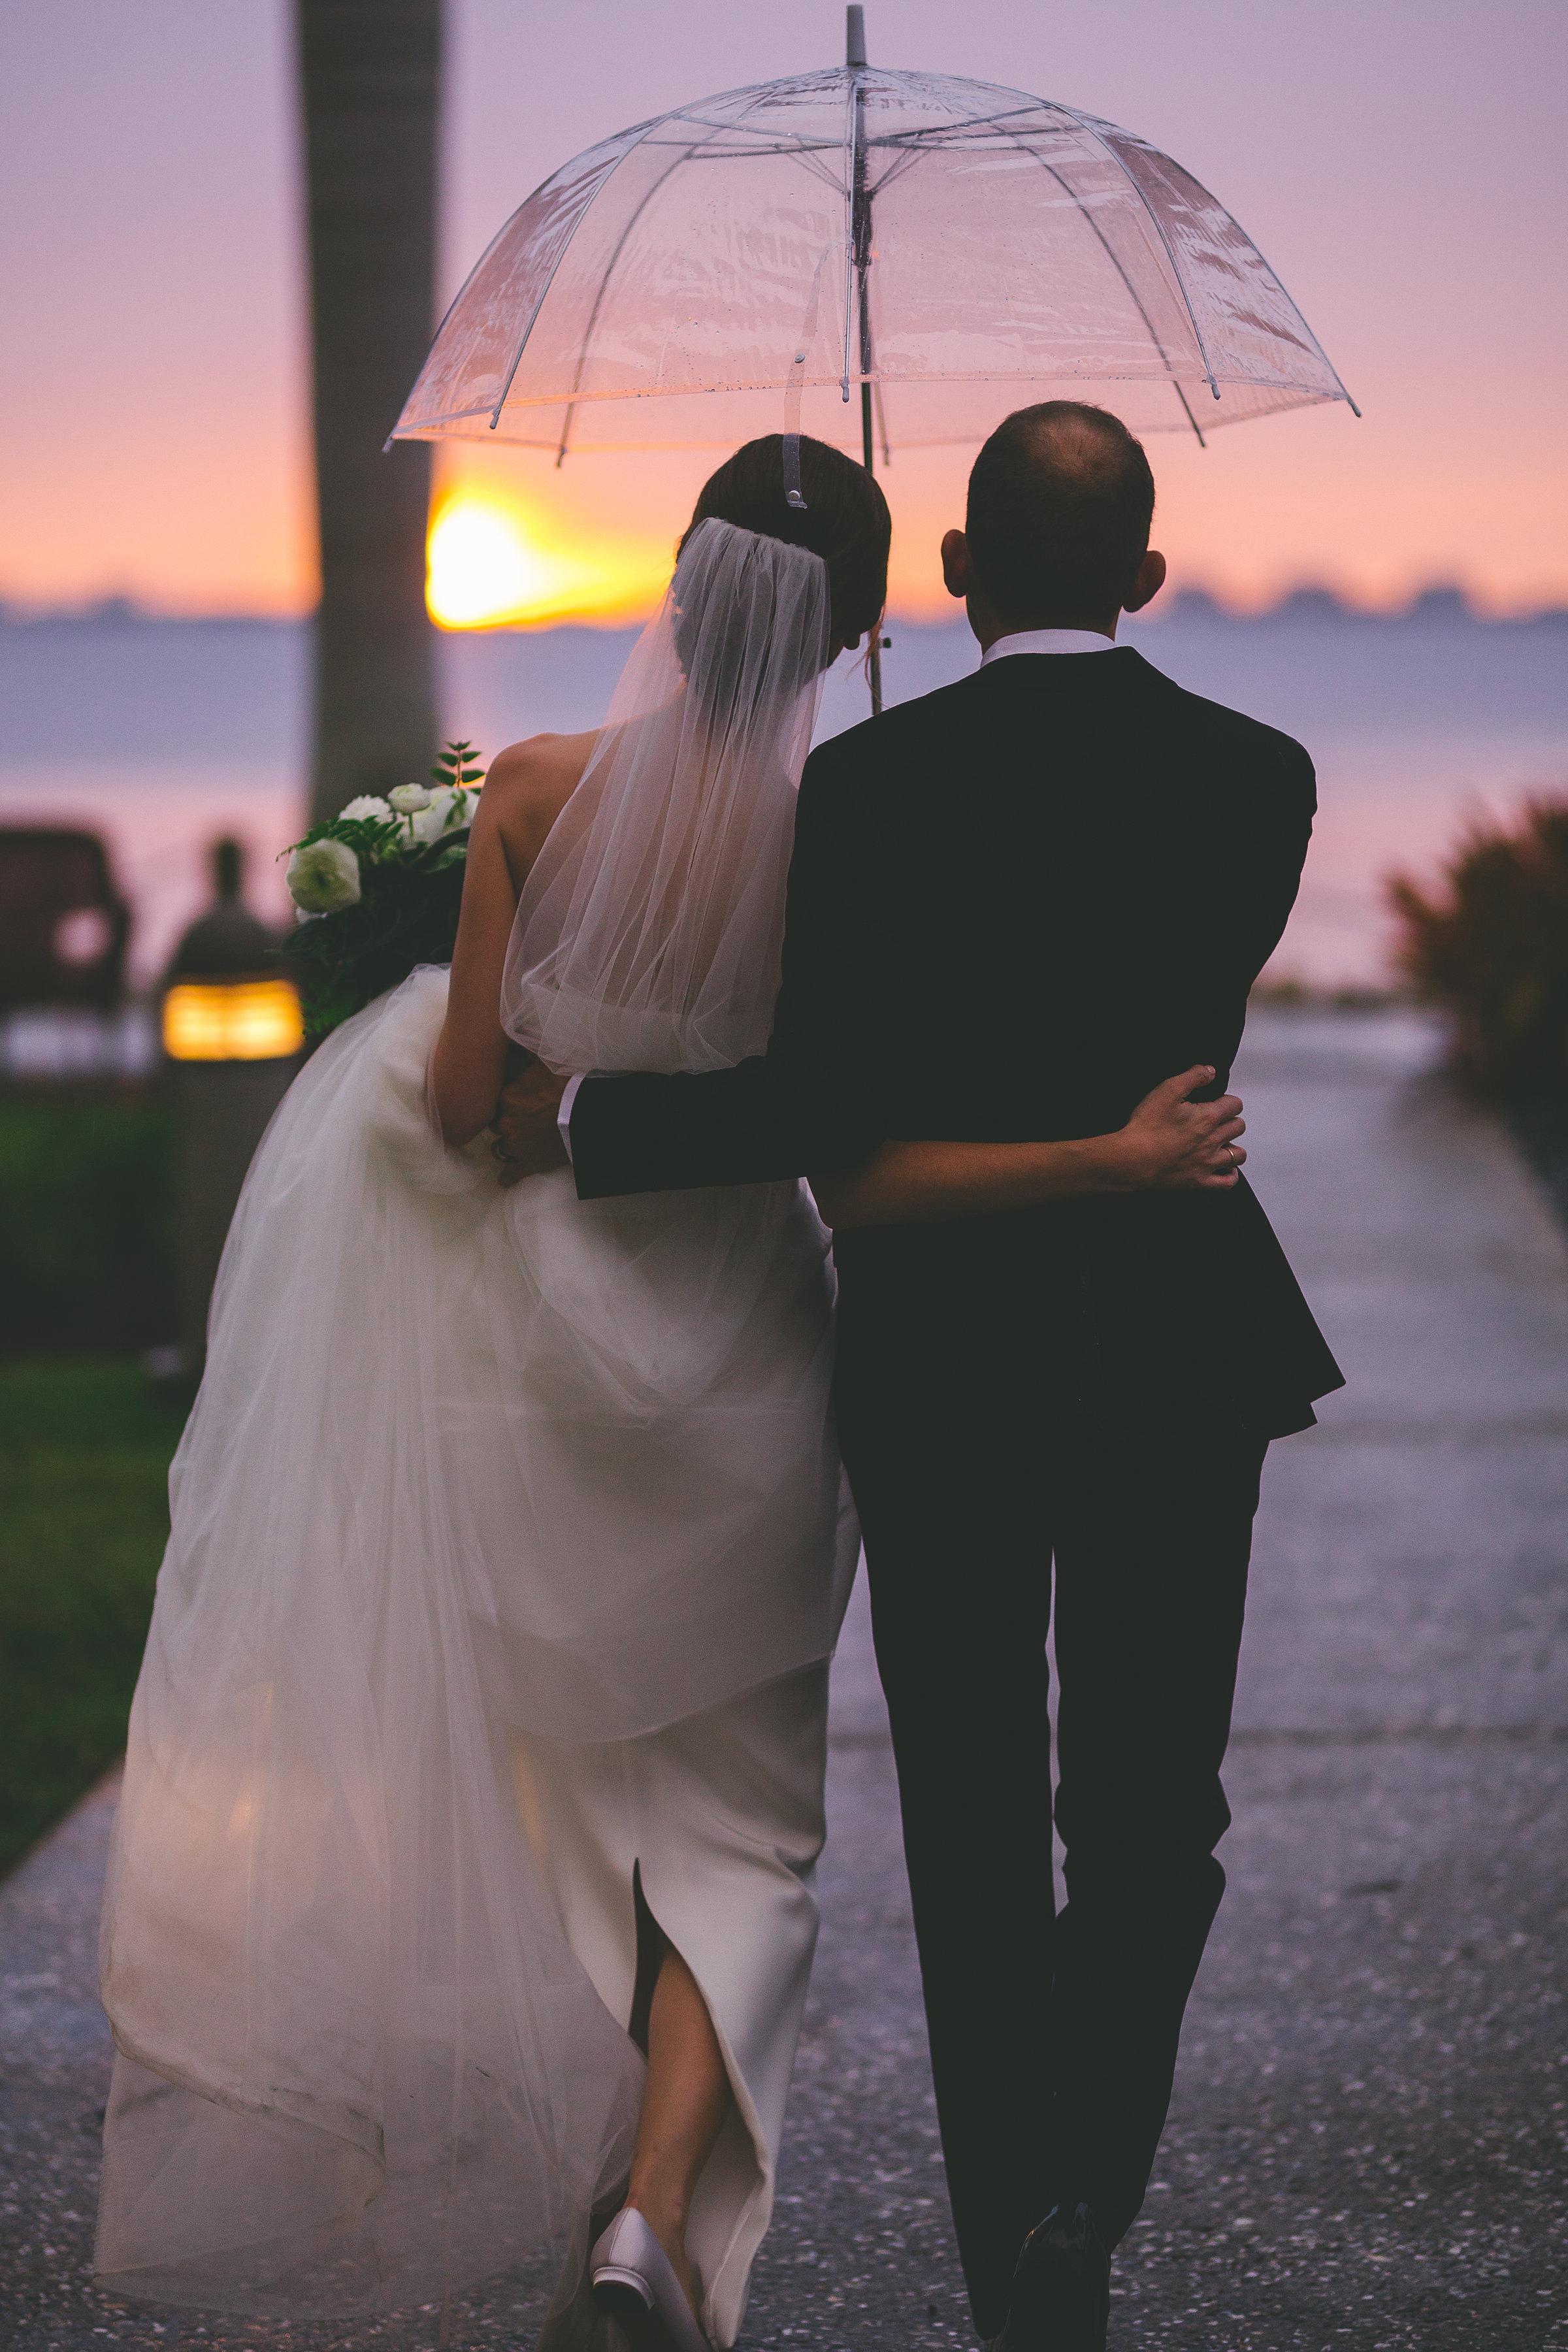 HighlightStudios-WeddingPhotographer-CourtneyandRob-899.jpg